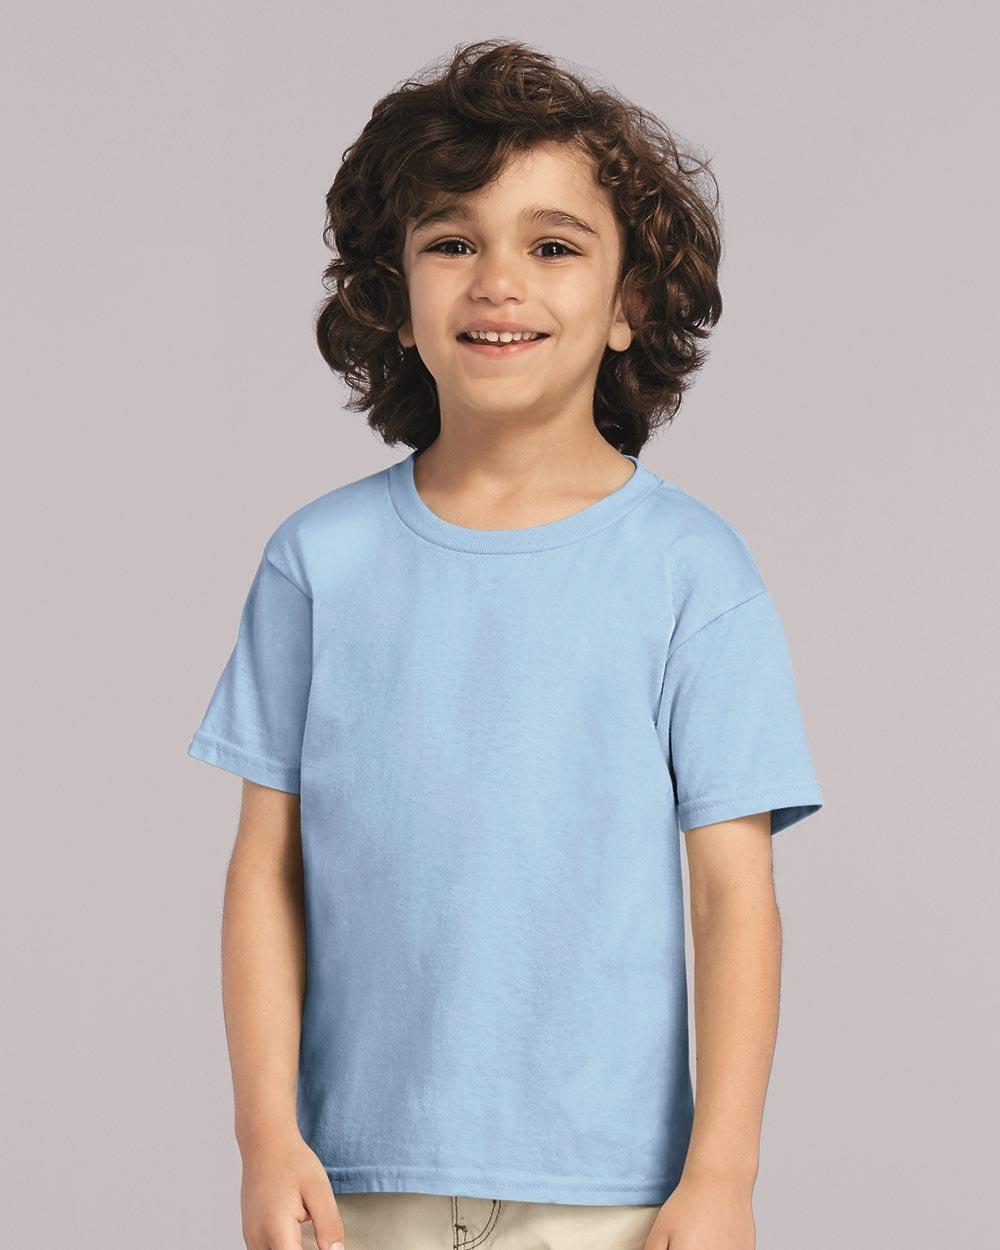 Gildan 5100P - Heavy Cotton Toddler T-Shirt